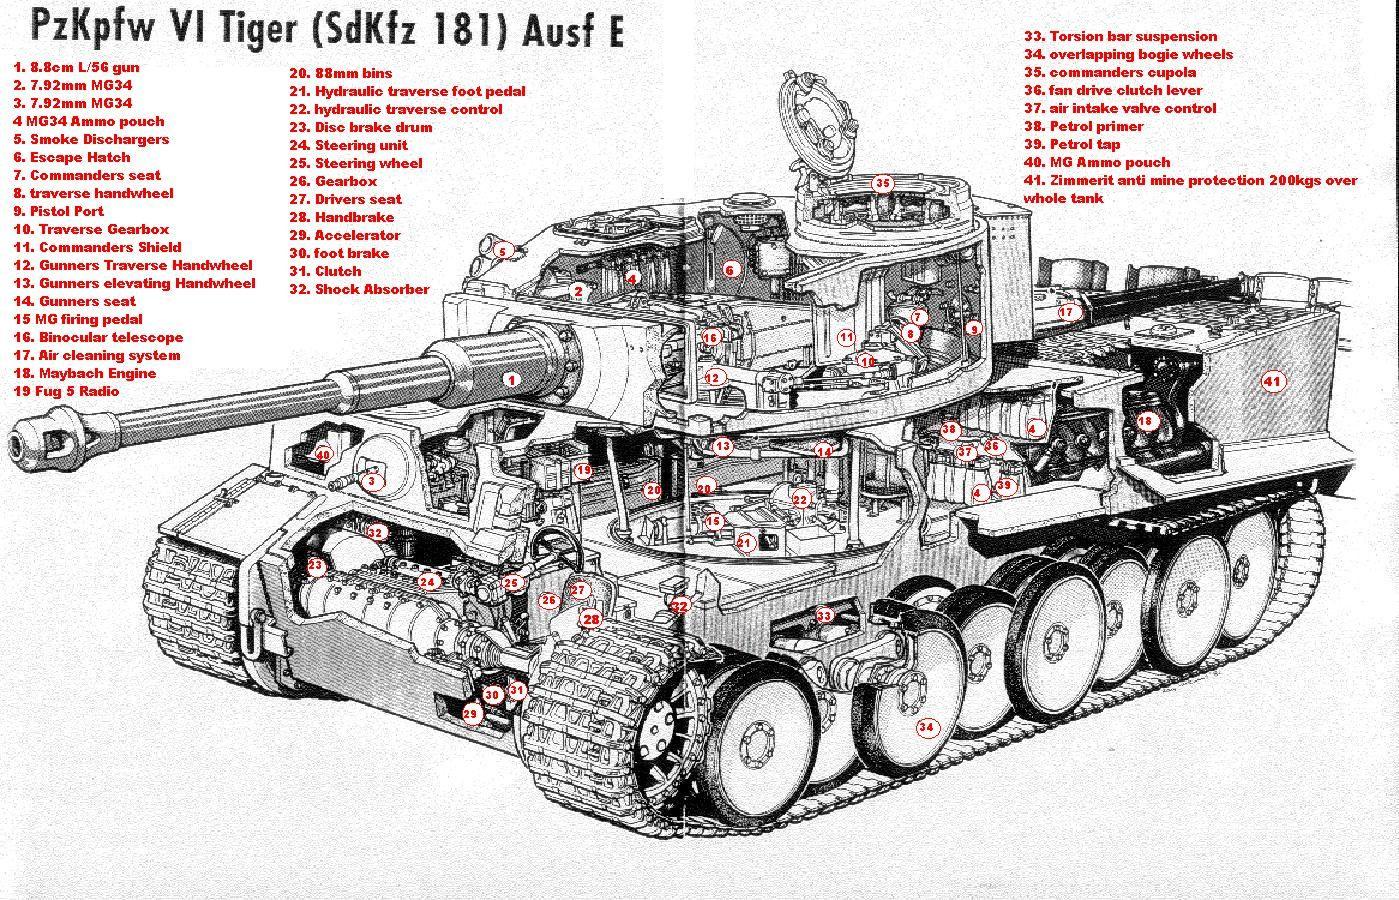 military tank minimum engagement distance - Google Search ...